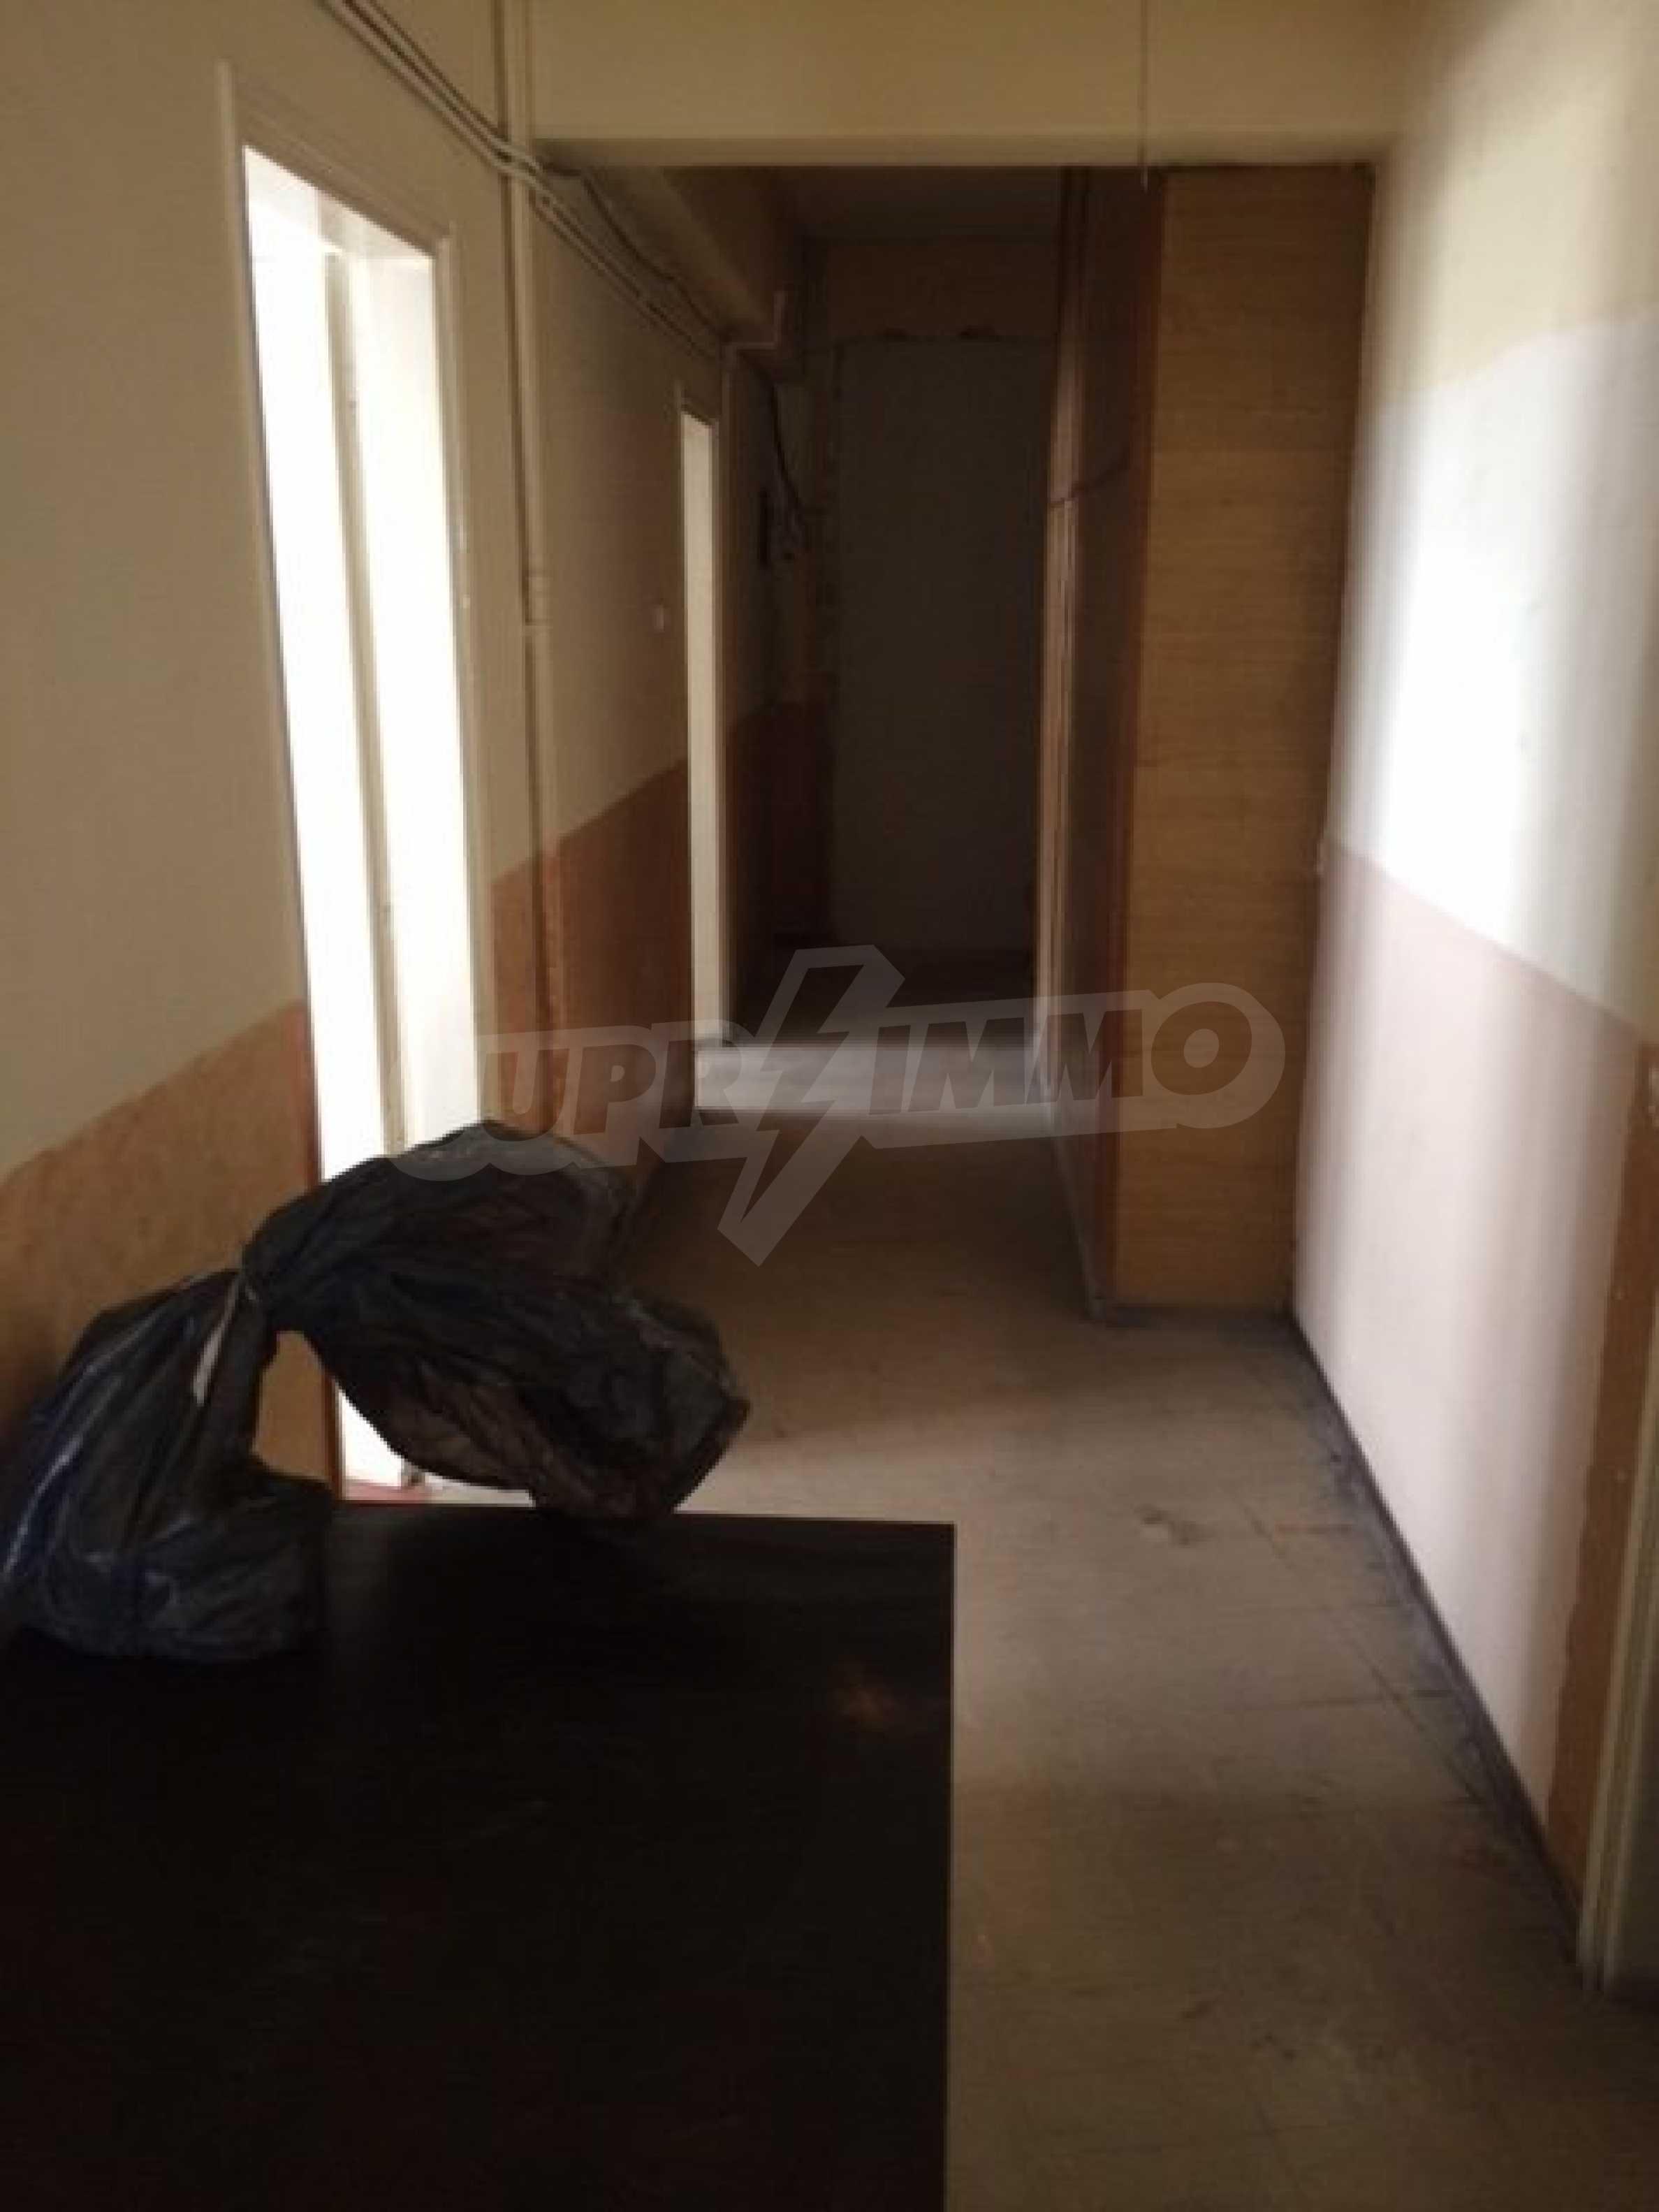 Четиристаен апартамент в Кавала 3